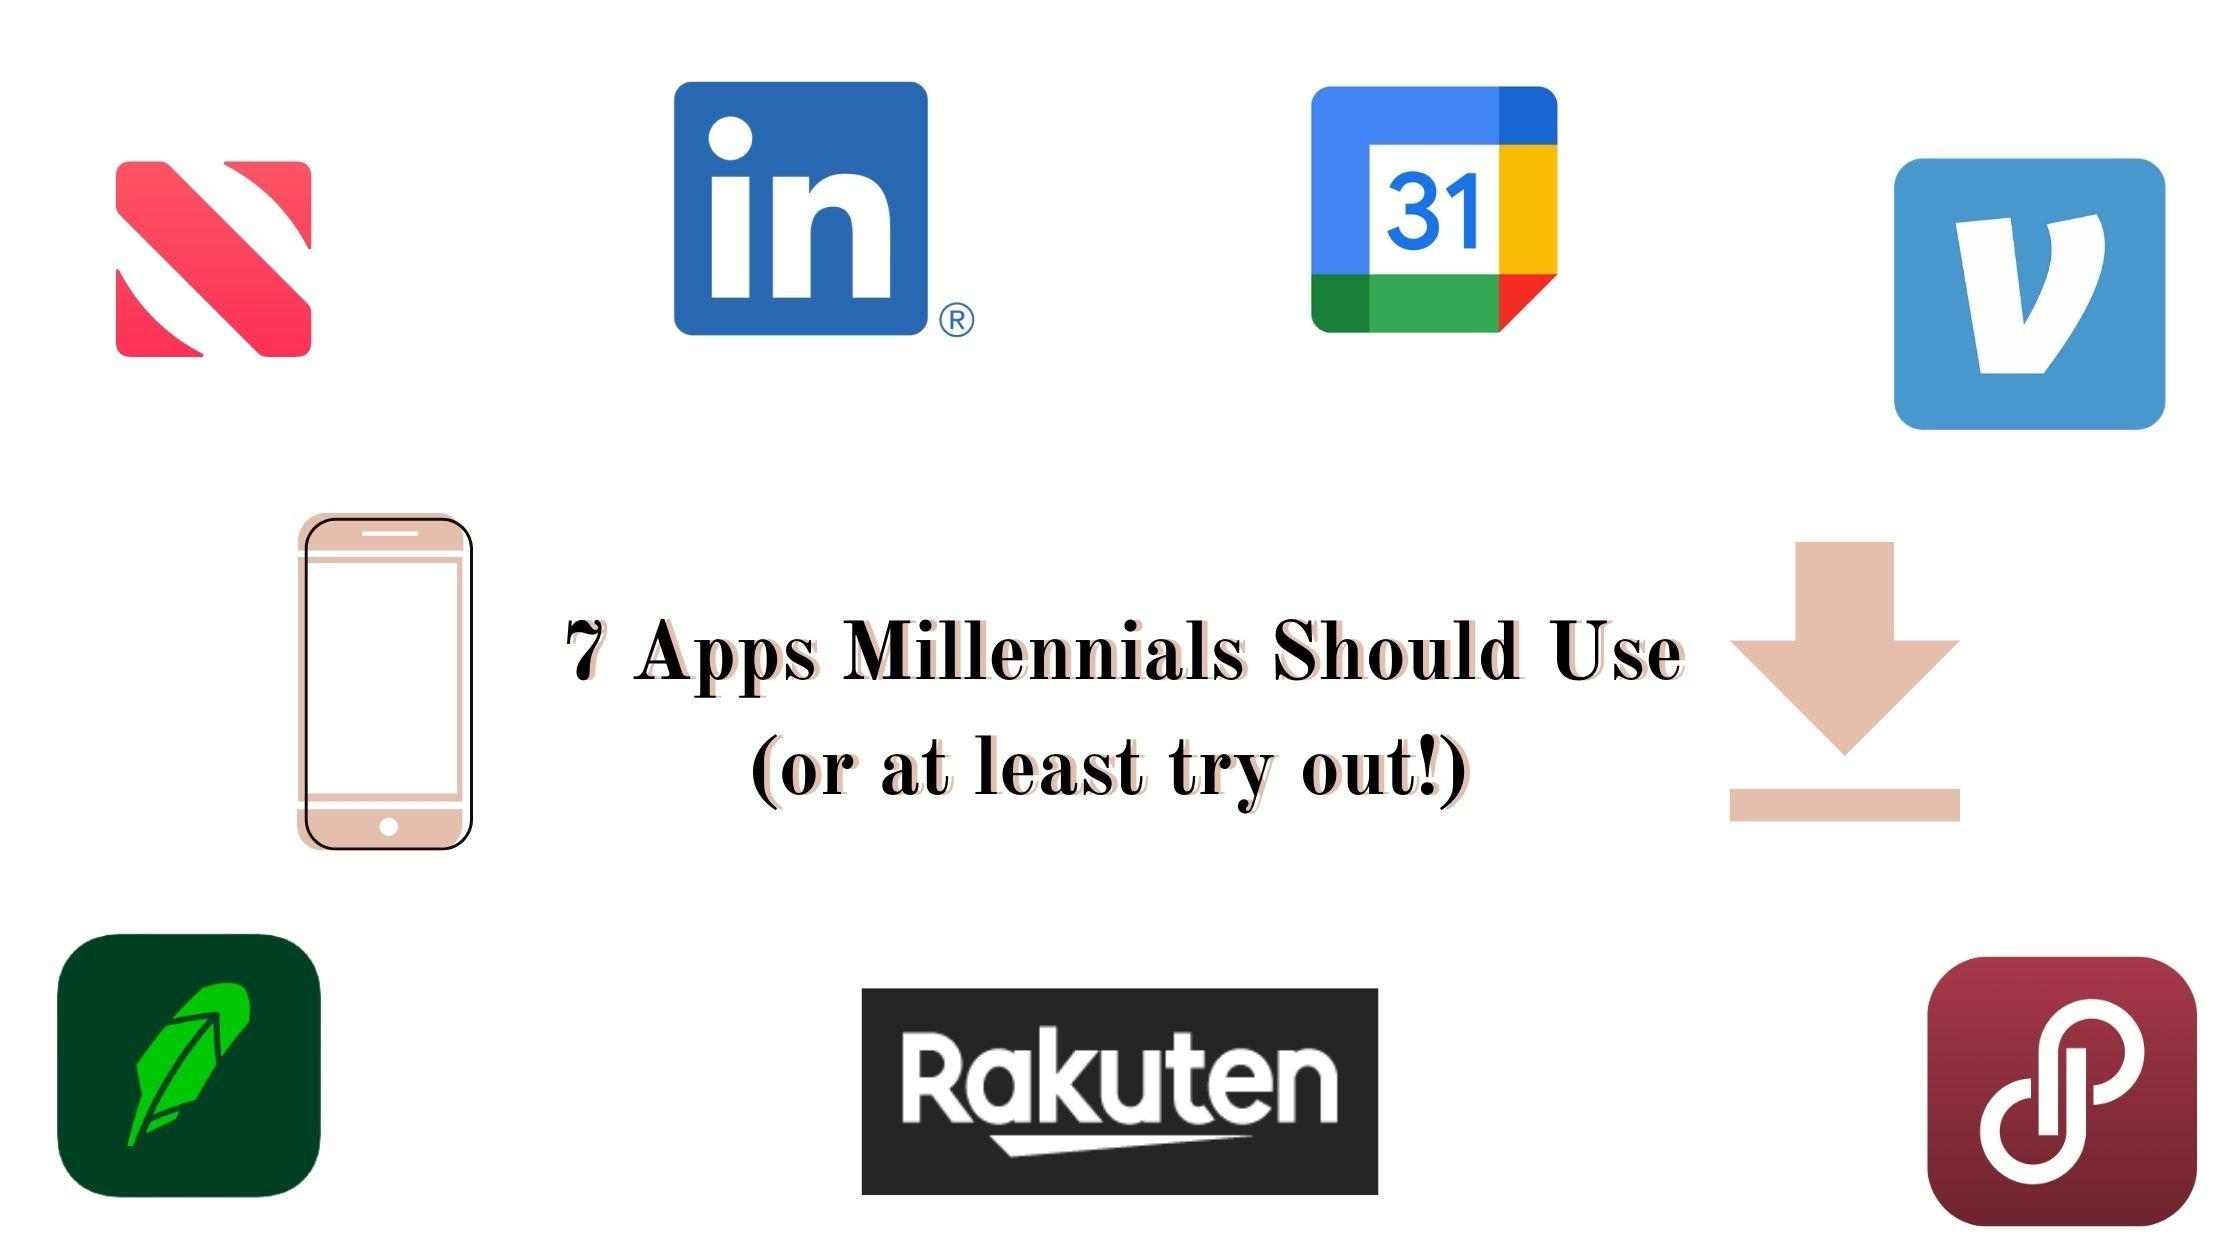 apps millennials should use